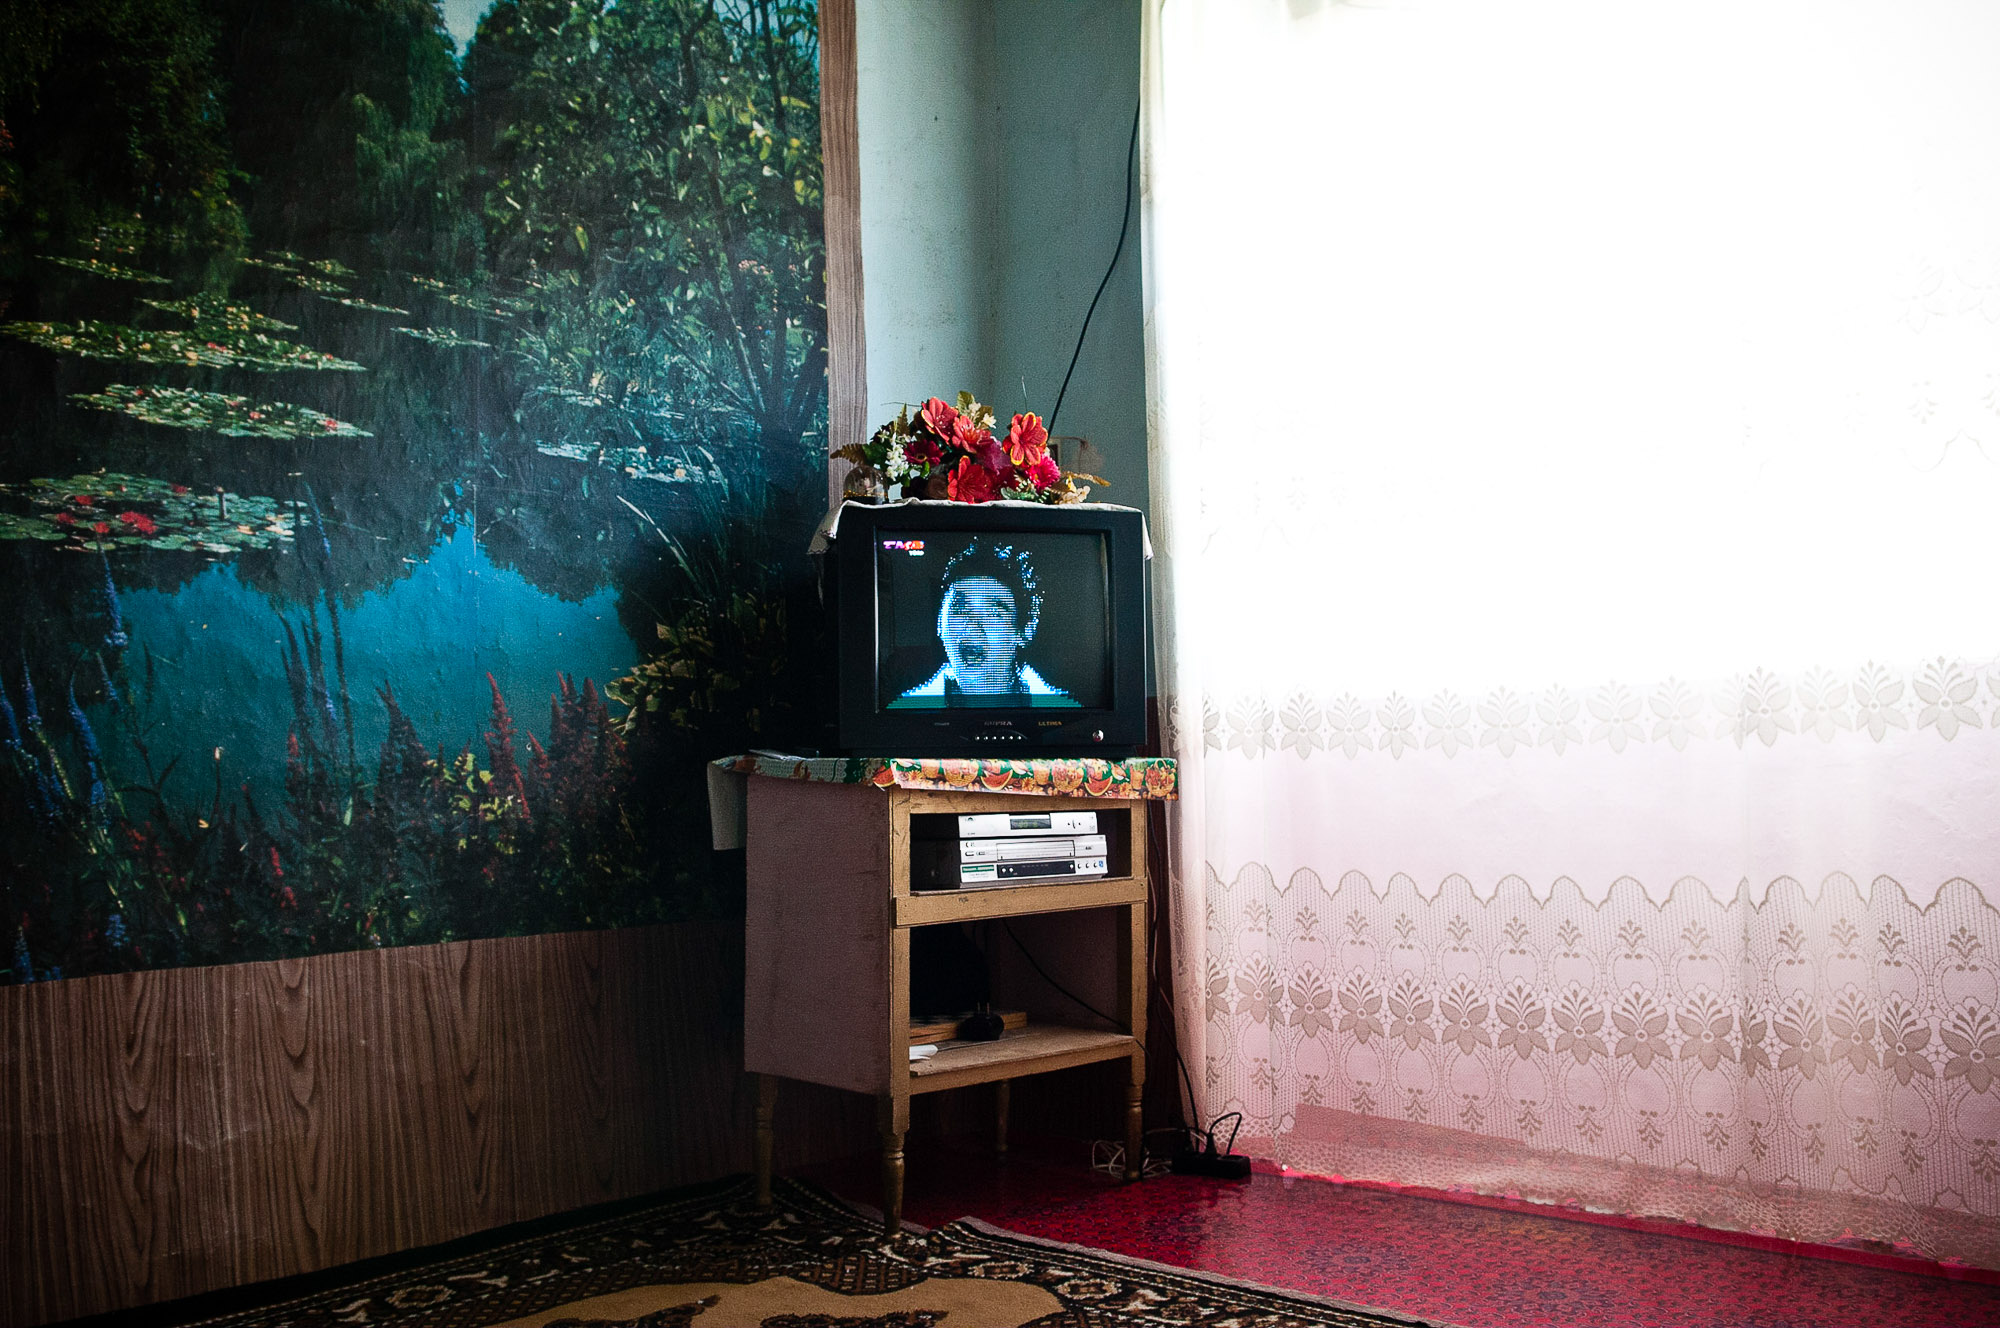 Television playing in a house, Xinaliq, Azerbaijan. © www.thomaspickard.com